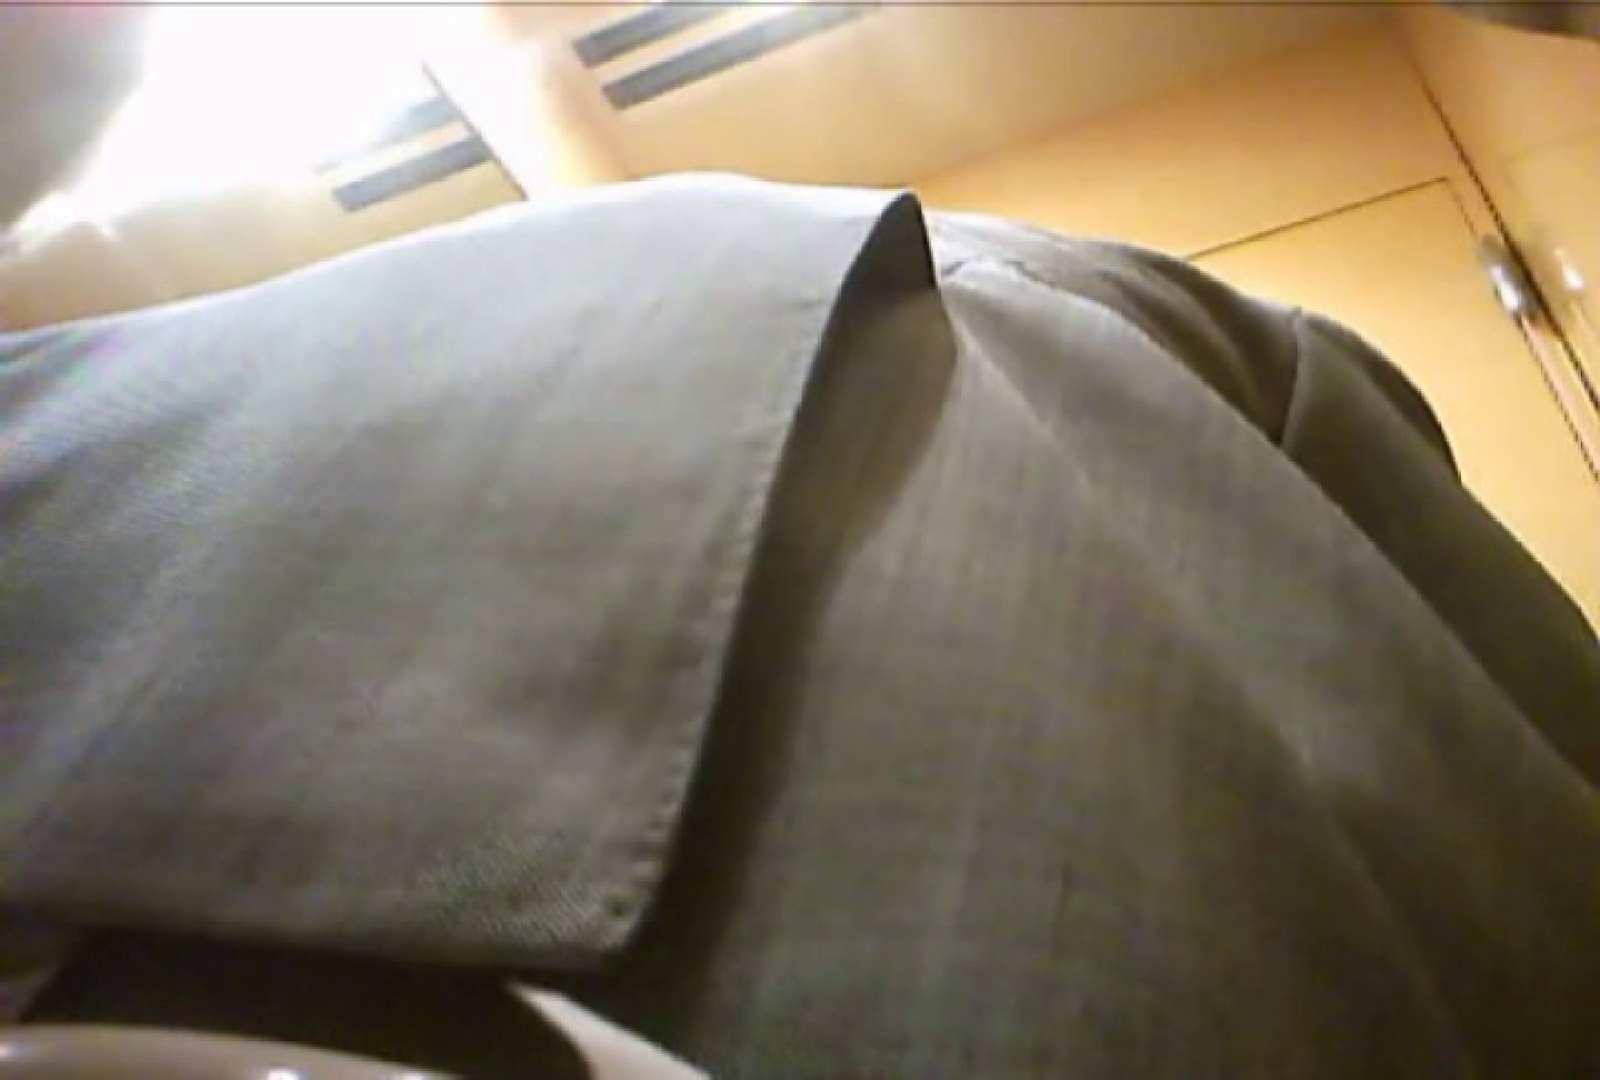 SEASON 2ND!掴み取りさんの洗面所覗き!in新幹線!VOL.02 スーツボーイズ | ノンケボーイズ  82pic 17